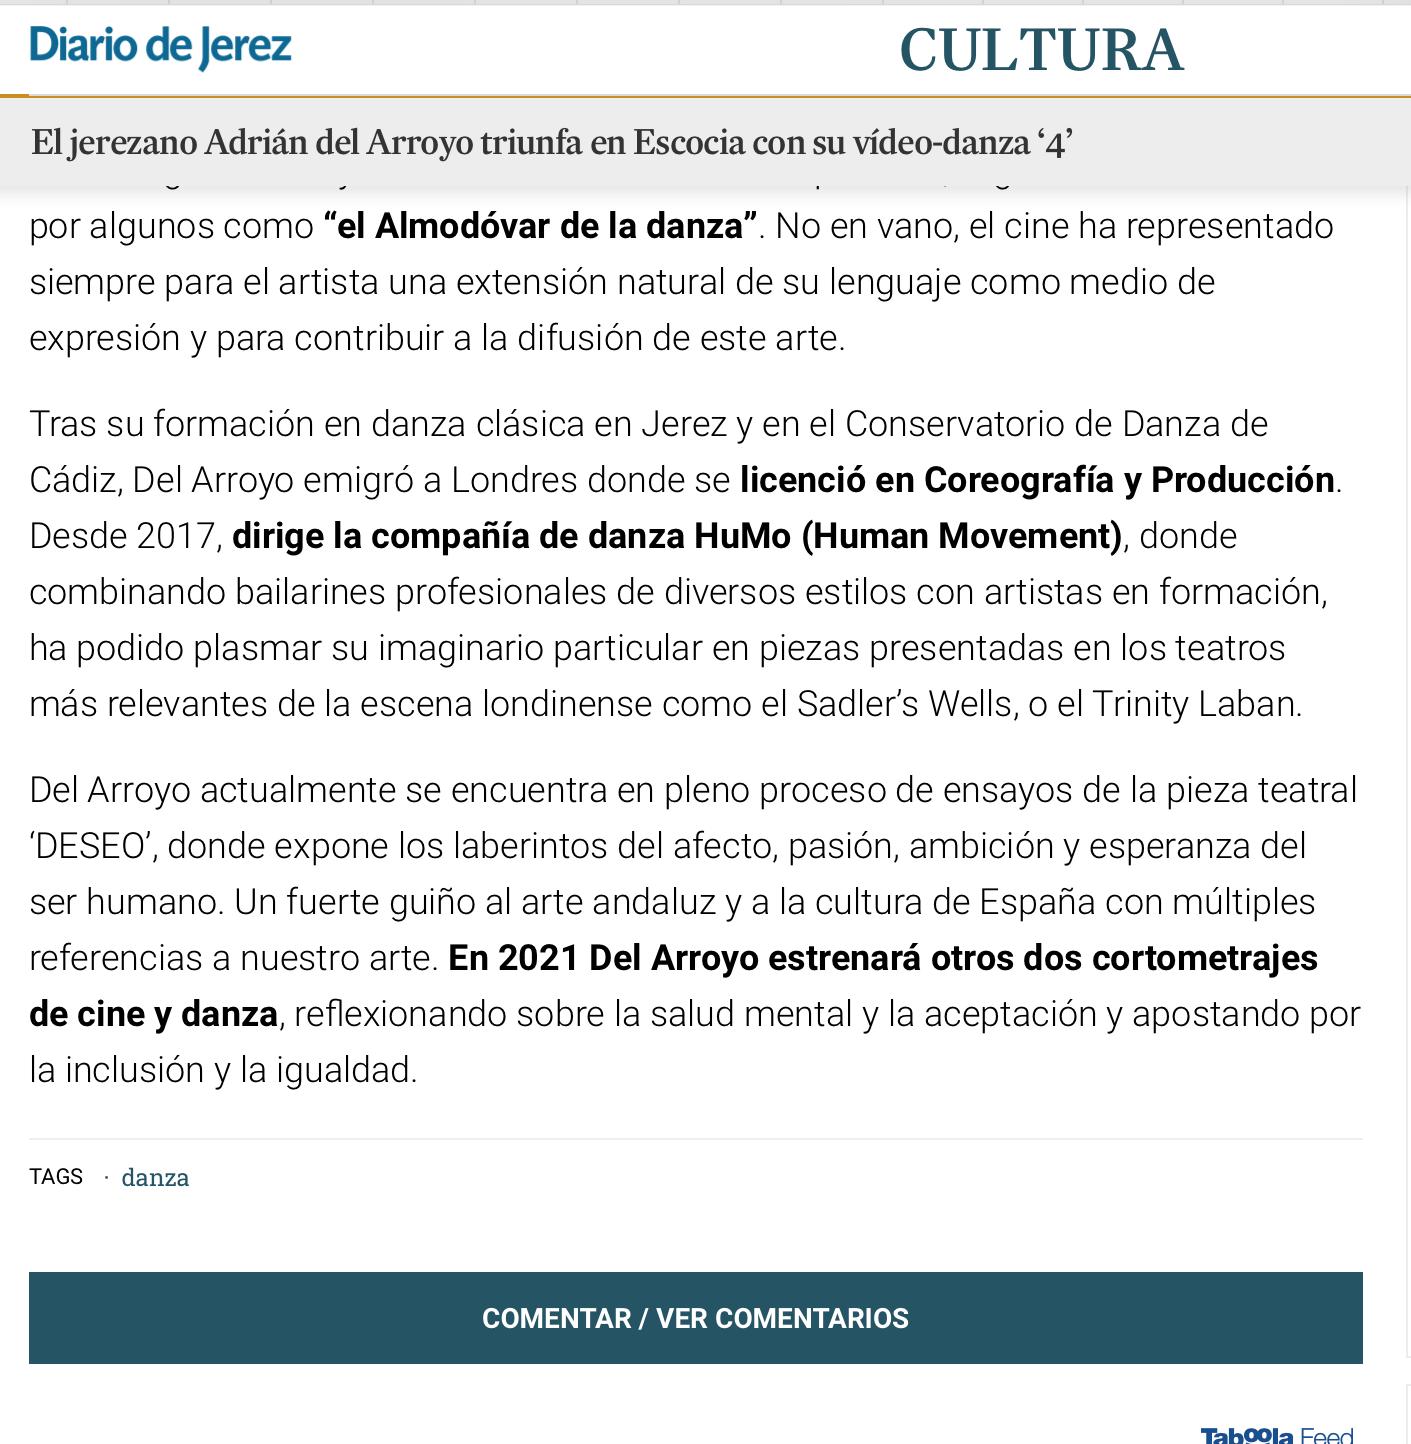 Diario de Jerez 4 Screenshot 2021-05-02 at 20.16.12